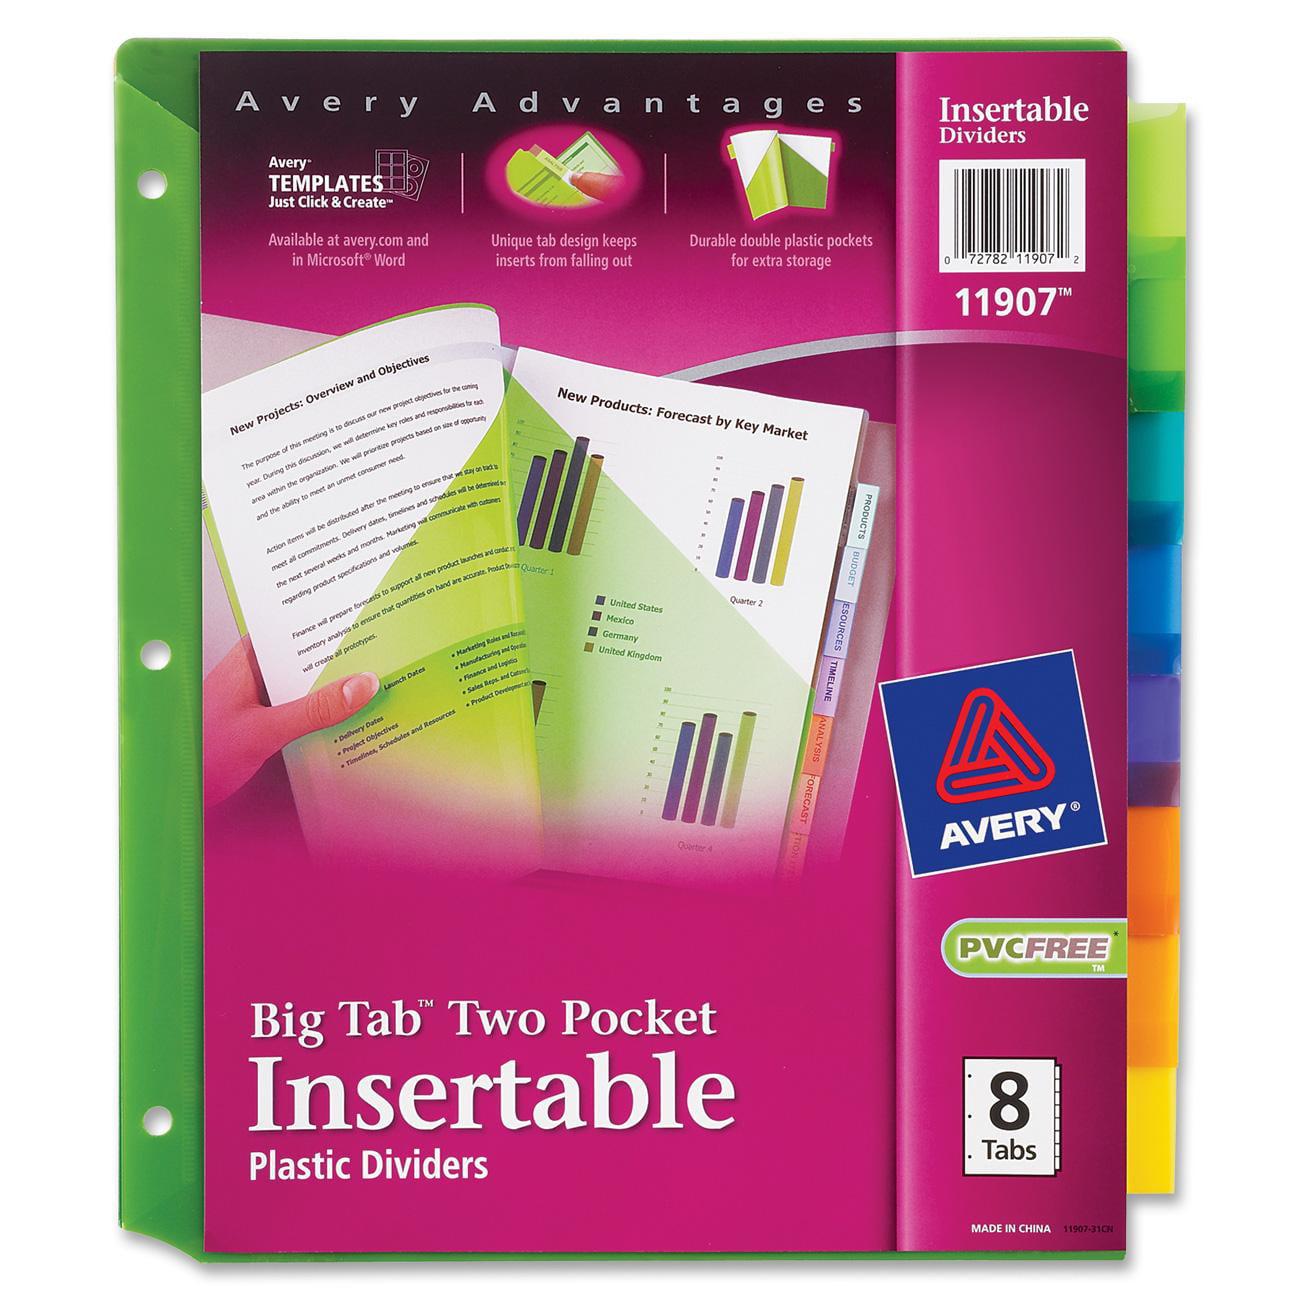 Avery Big Tab Insertable Two-Pocket Plastic Dividers, 8-Tab, Multicolor (11907)